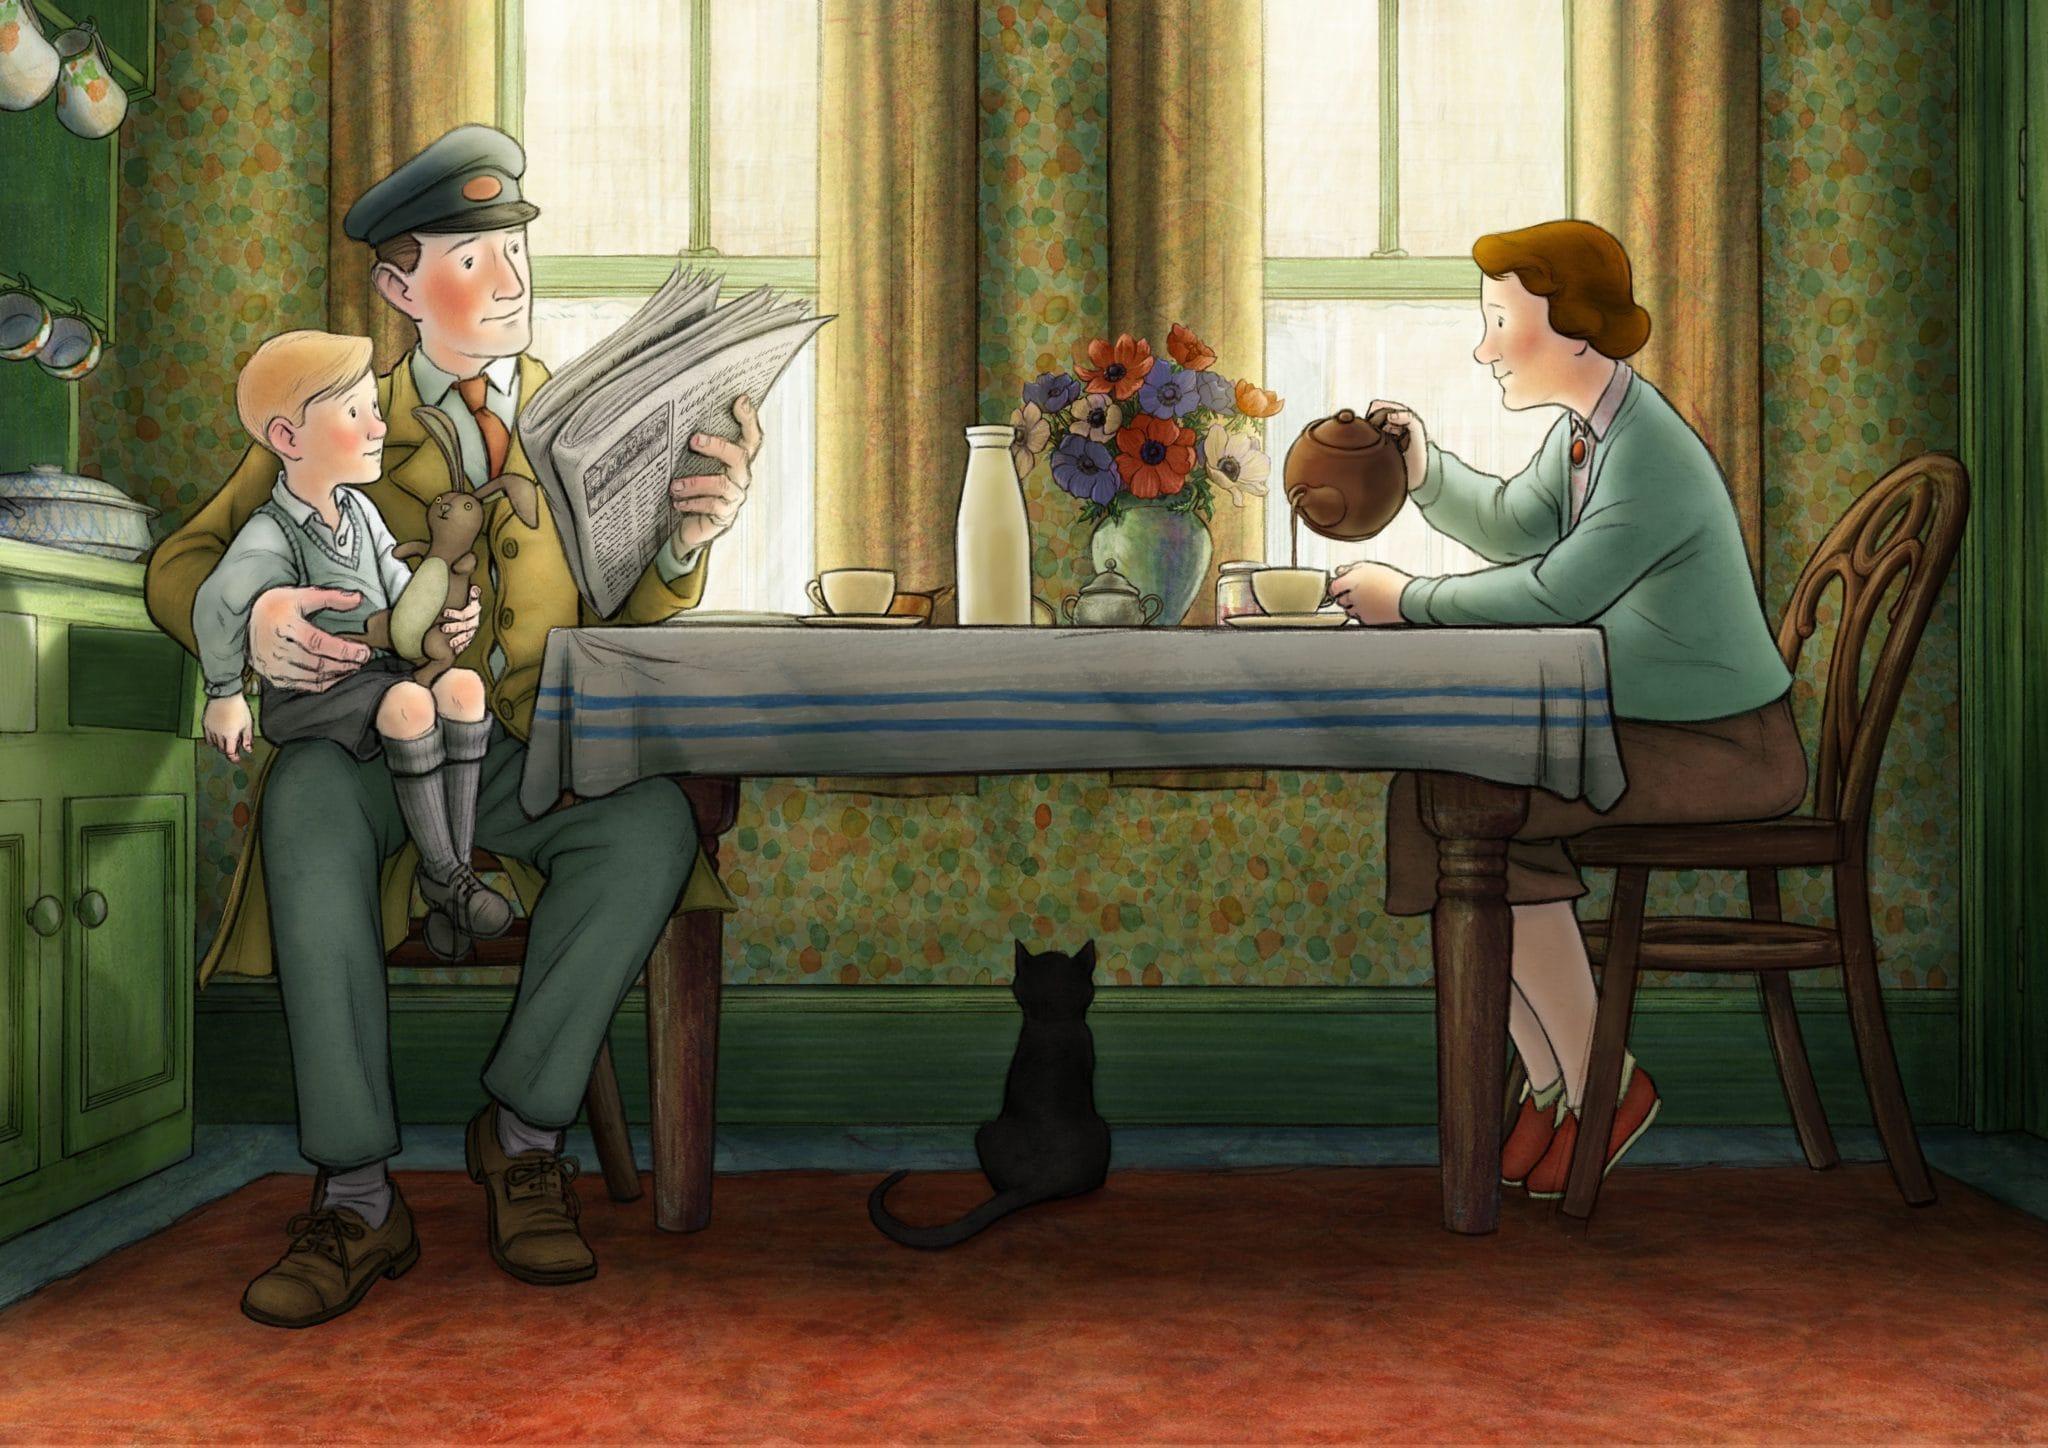 Festival international du film d'animation d'Annecy 2017 image Ethel And Ernest